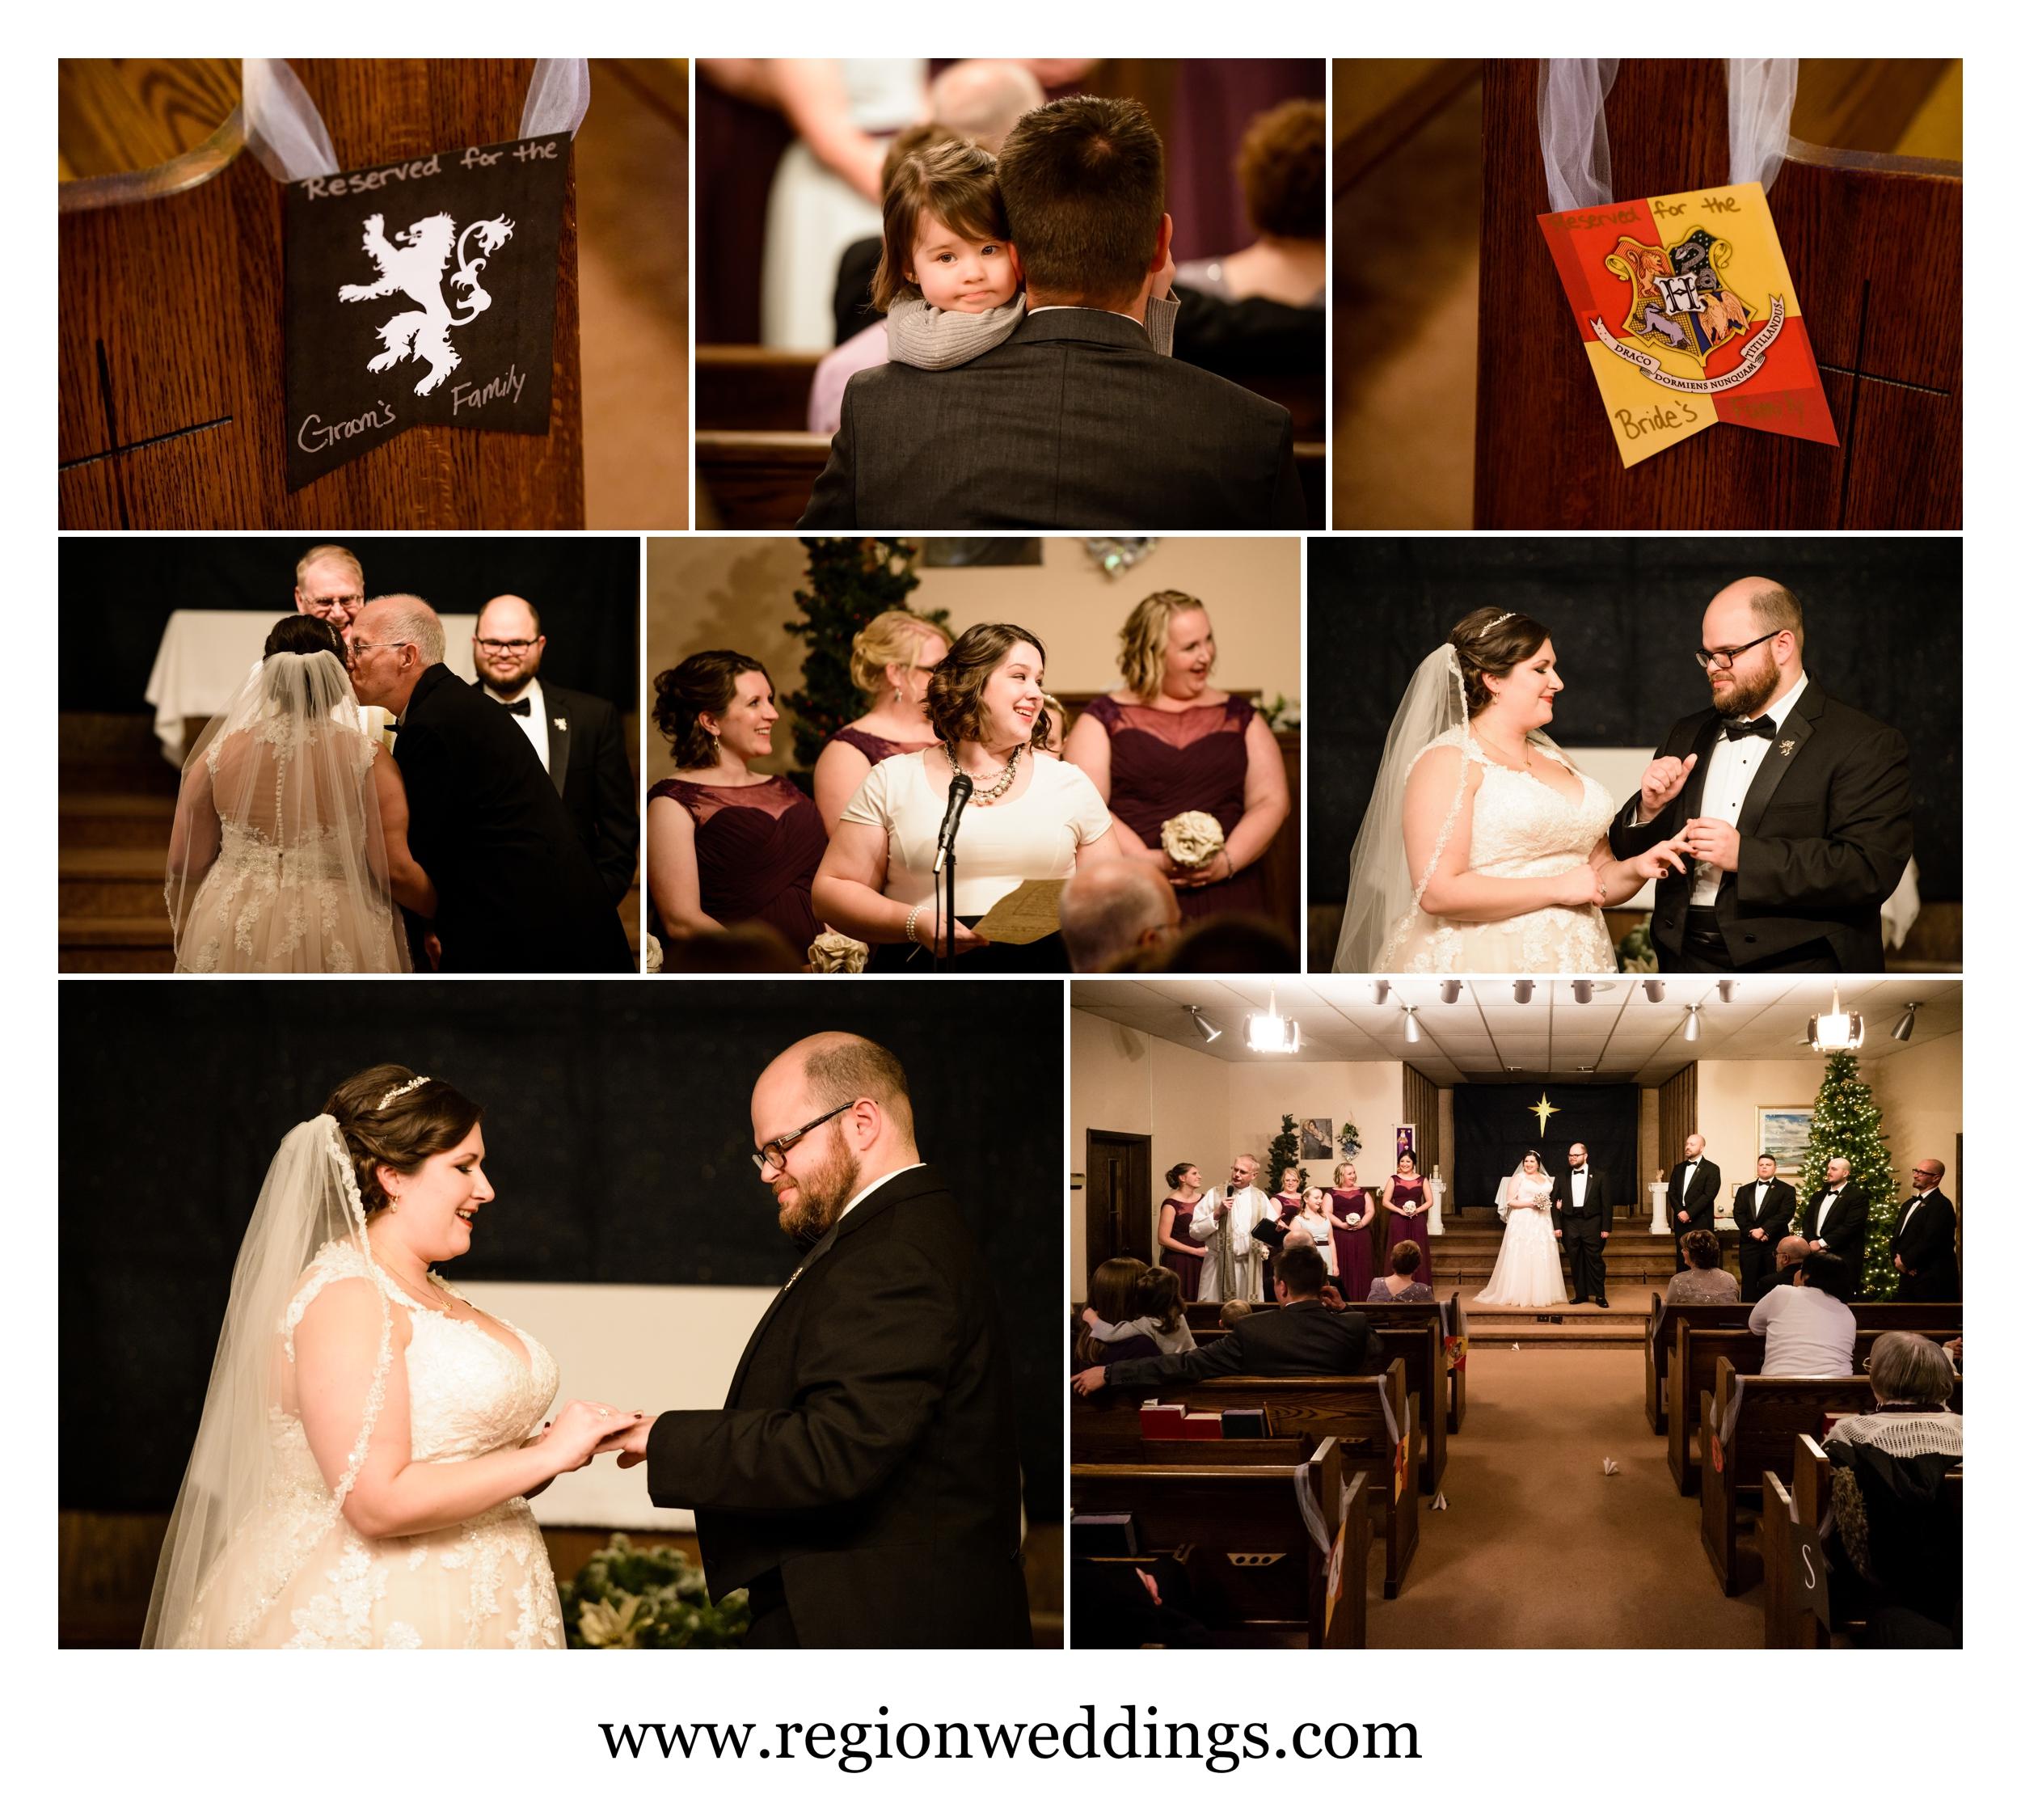 December wedding ceremony at Free Spirit Church in Crown Point, Indiana.